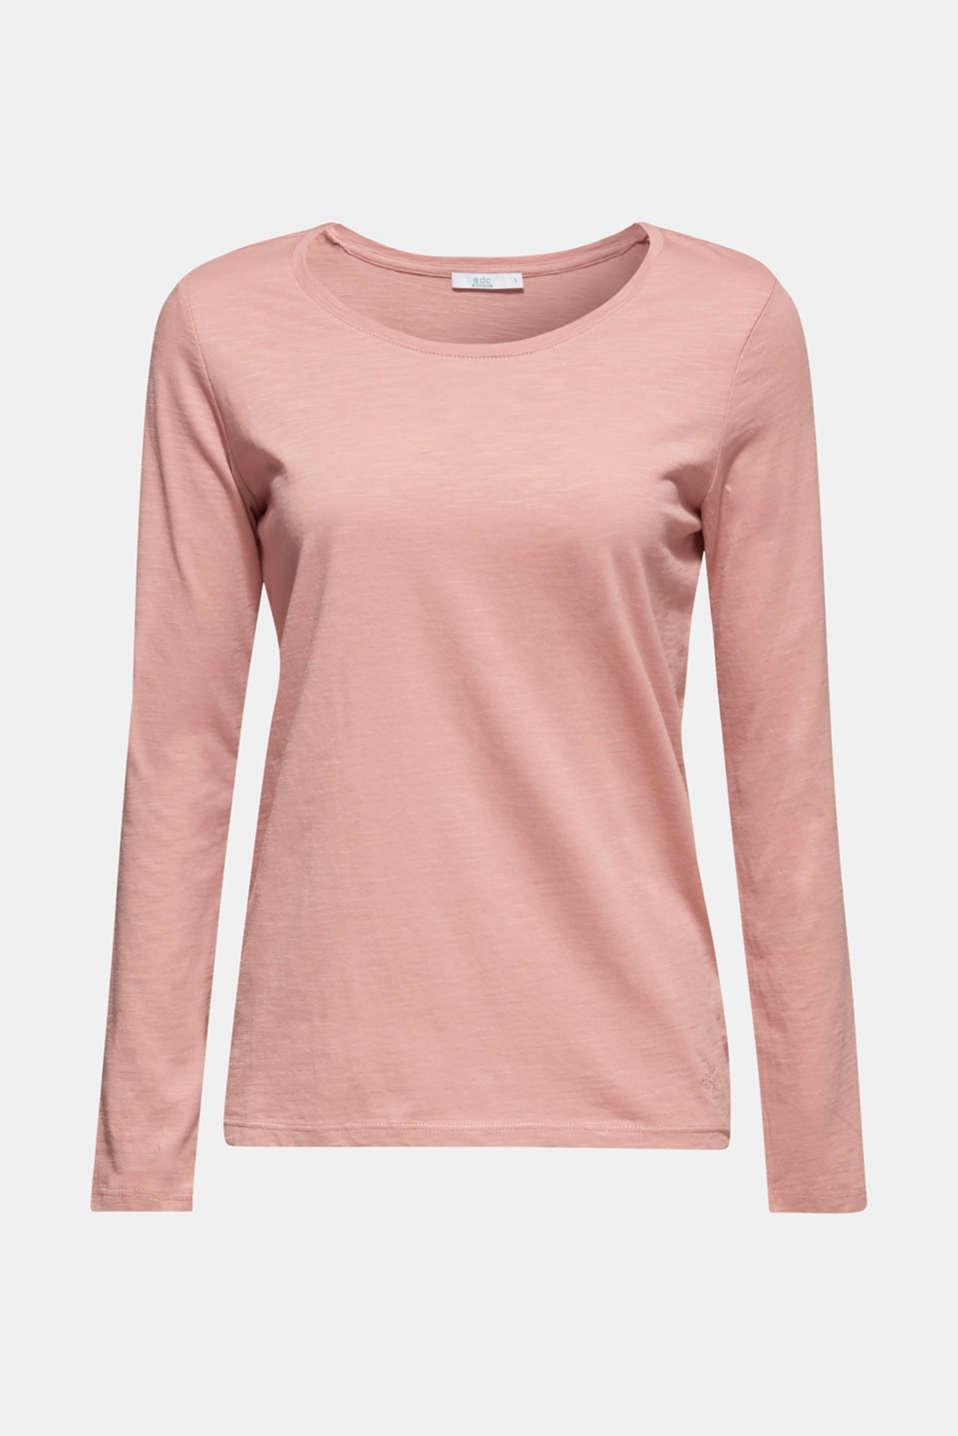 T-Shirts, OLD PINK 3, detail image number 6